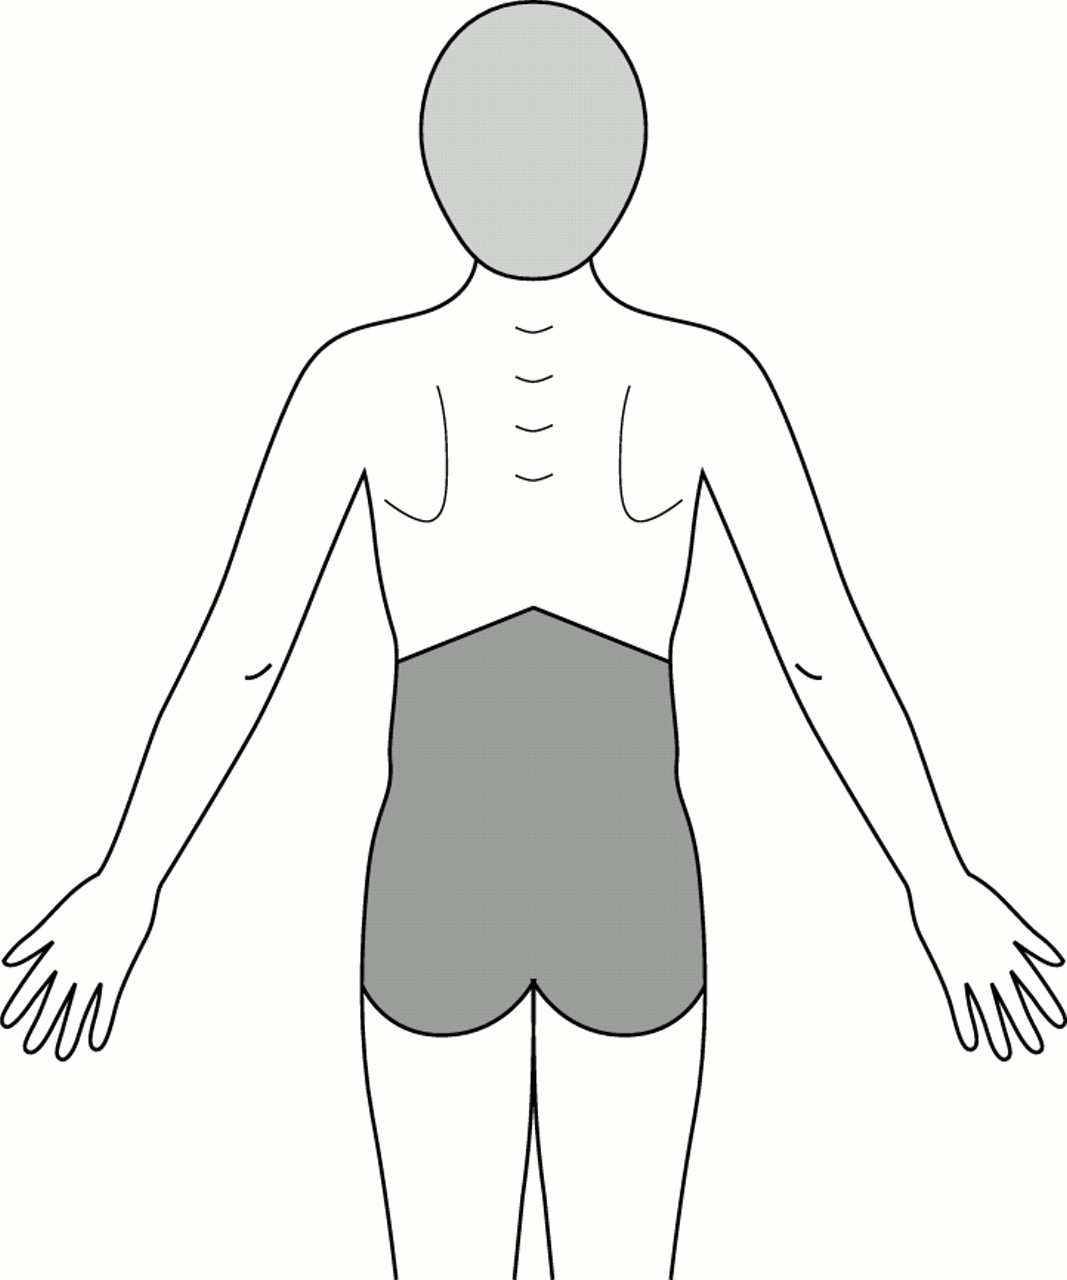 1067x1280 Low Back Pain In Schoolchildren The Role Of Mechanical